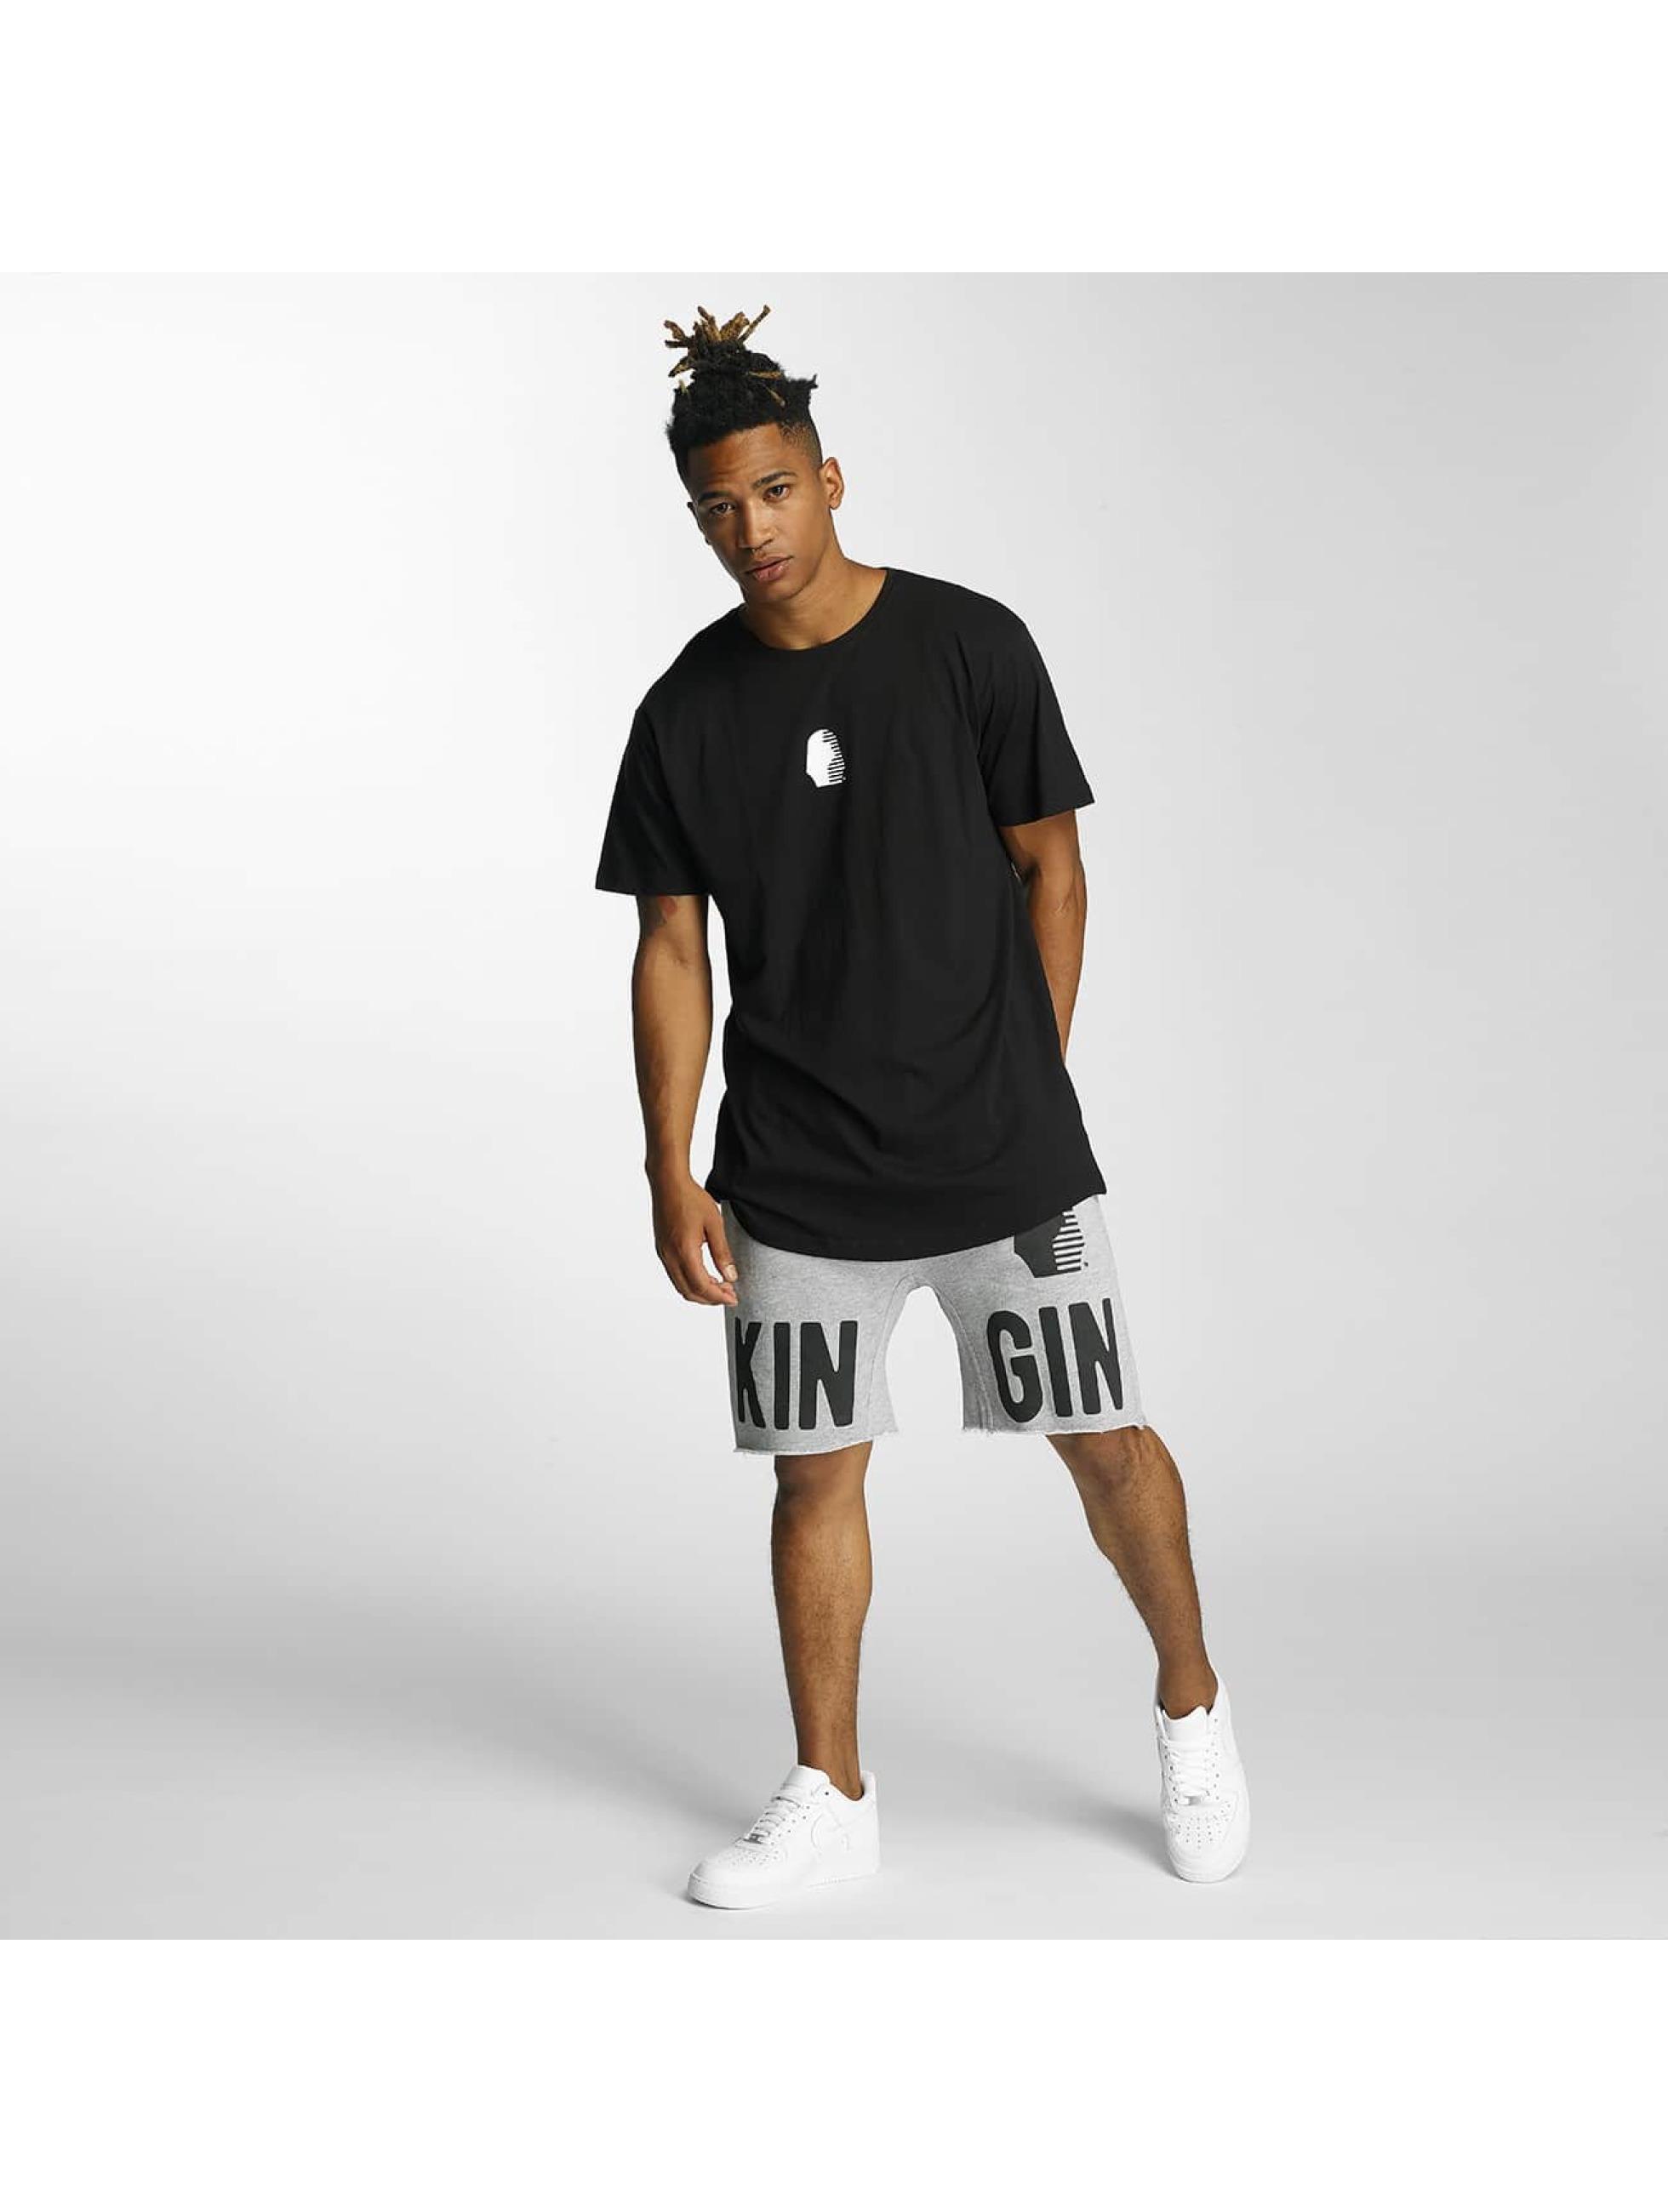 Kingin T-Shirt Comp. noir